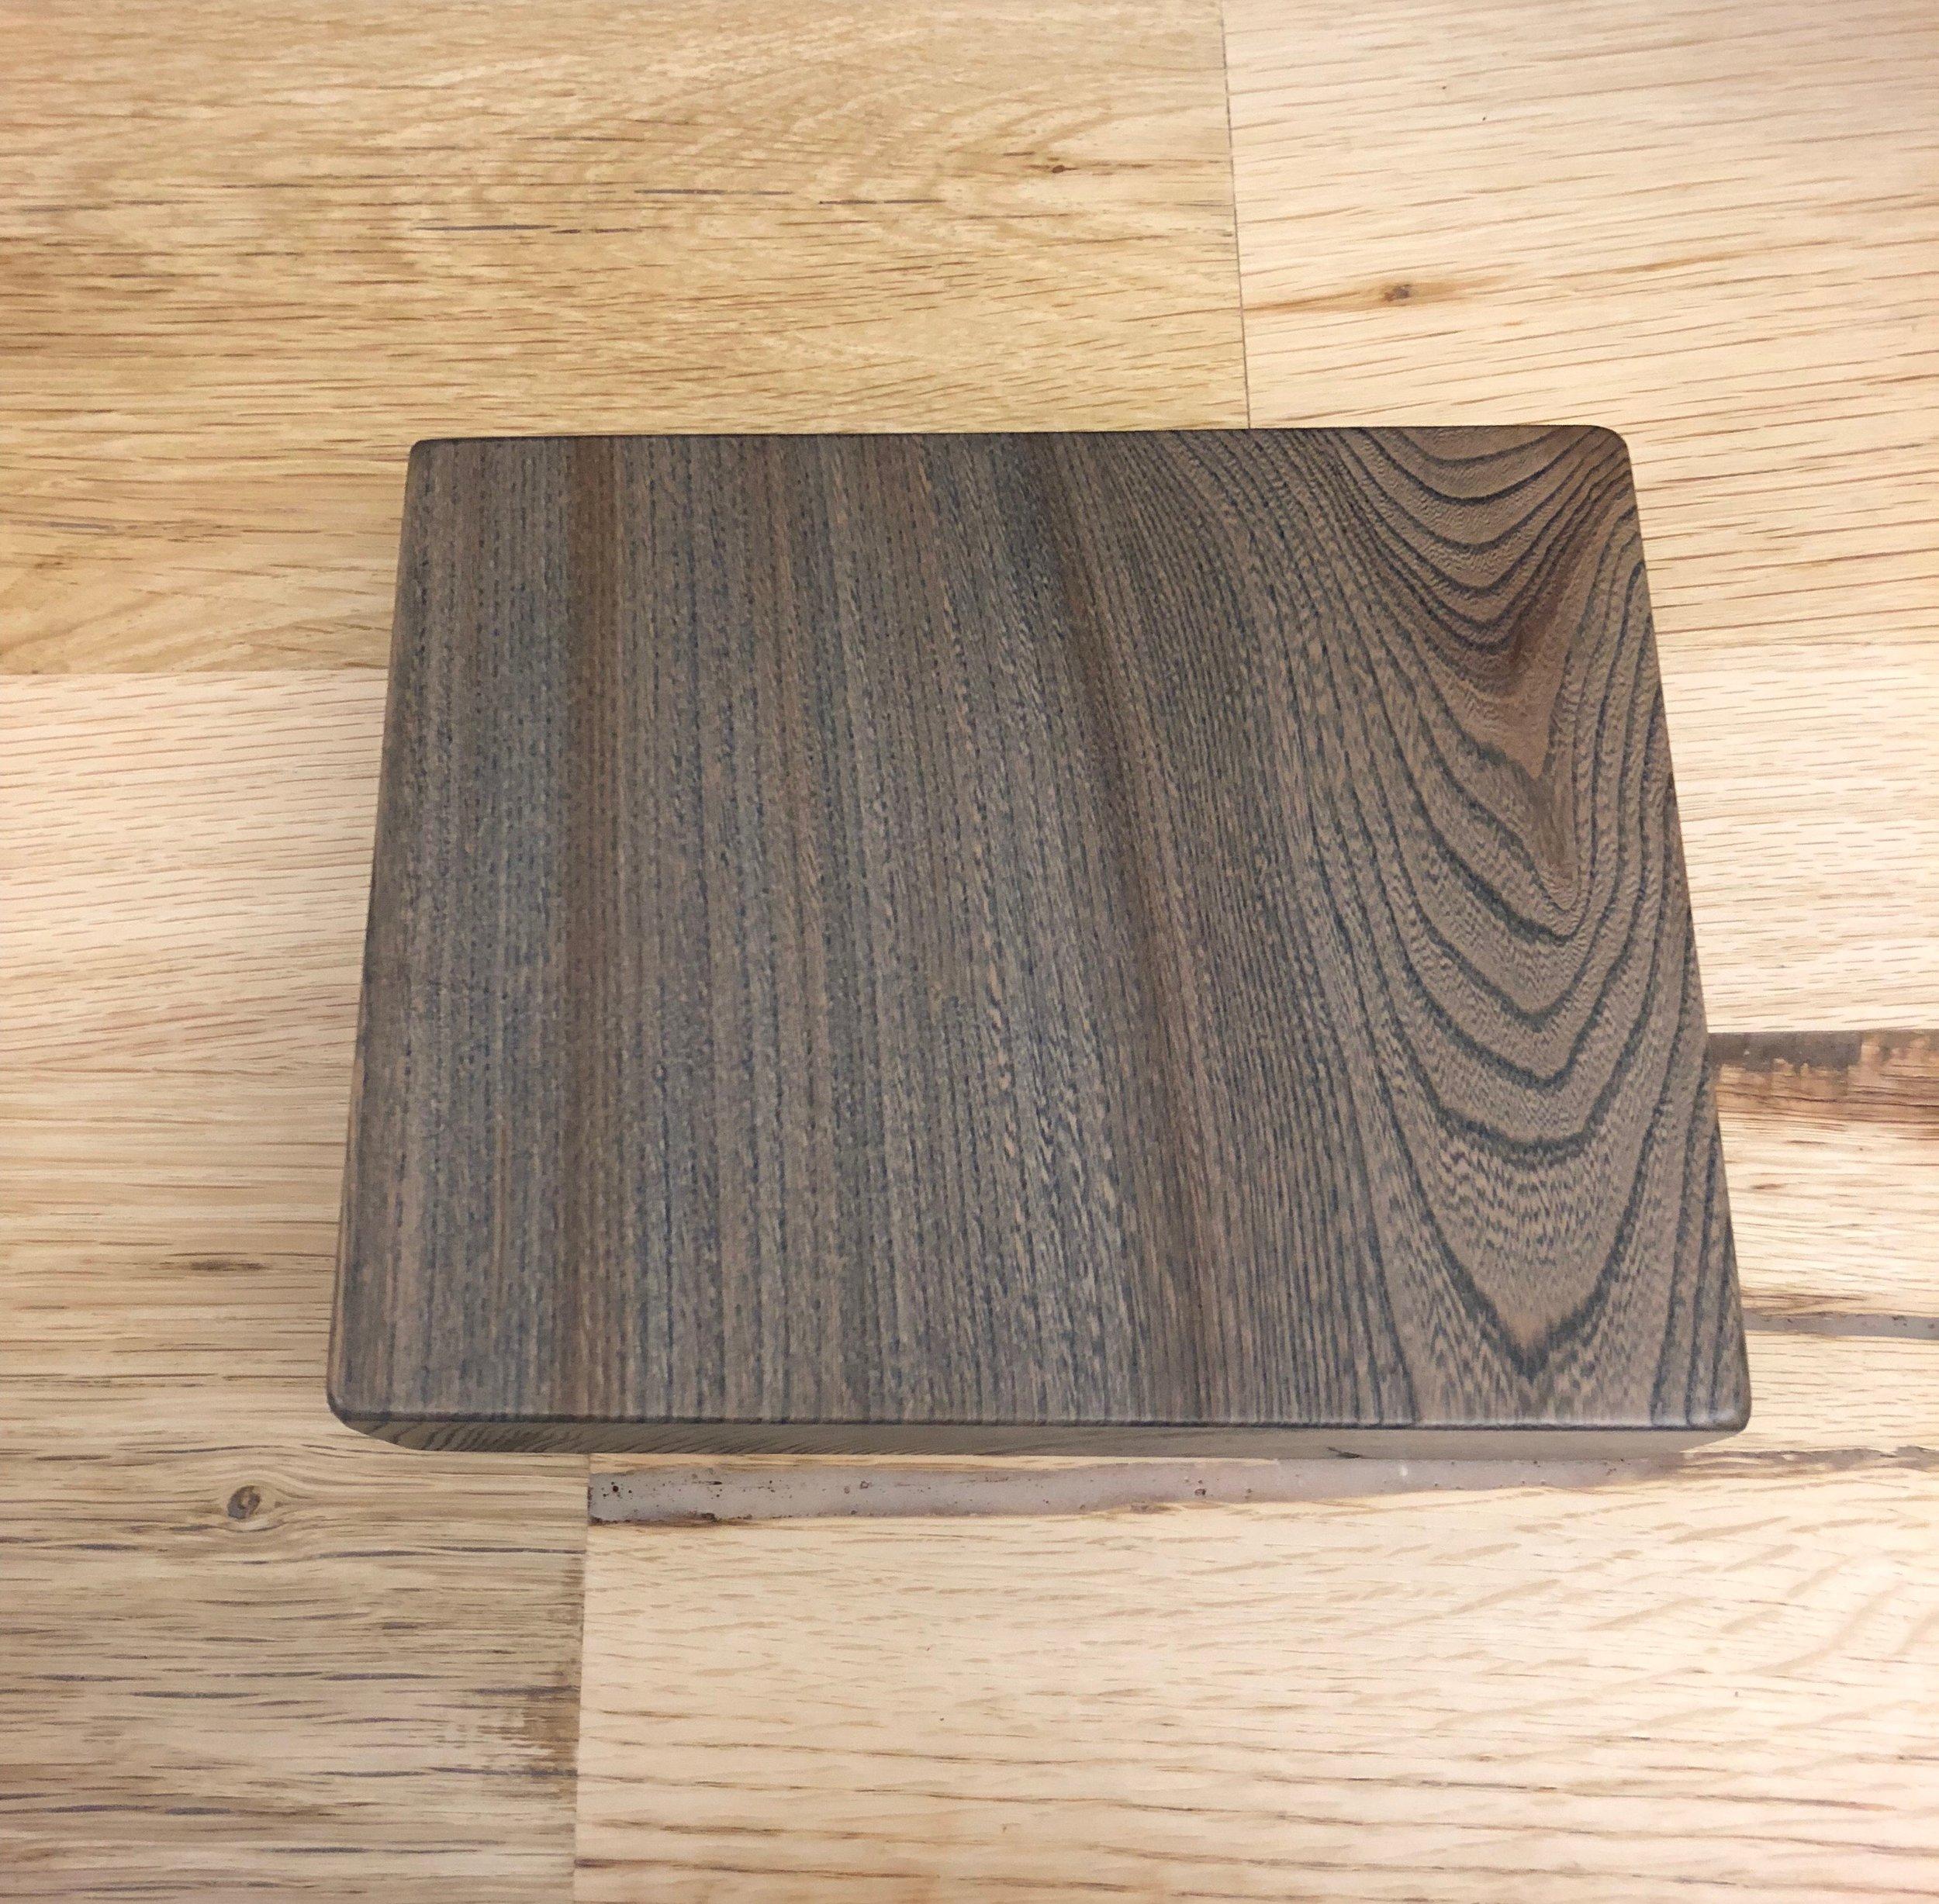 Elm / smooth / denim stain / polyurethane